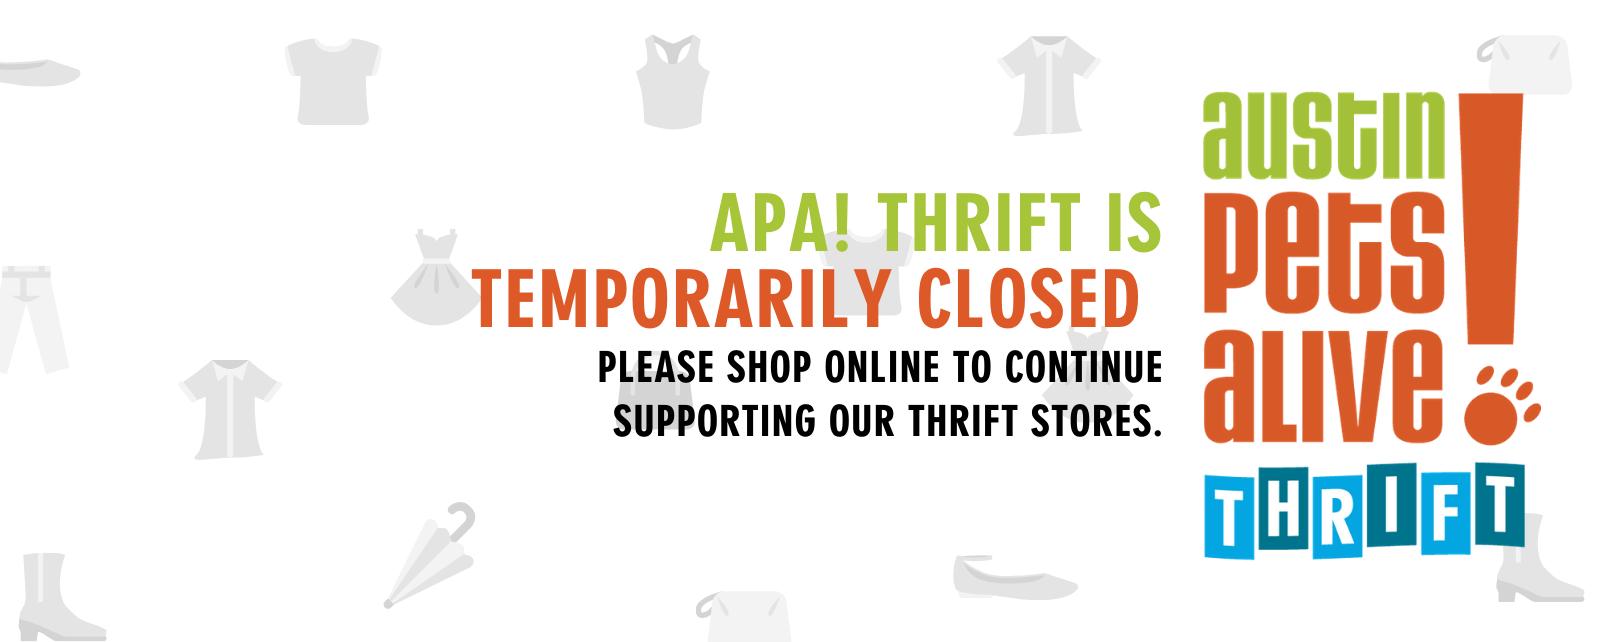 APA Homepage THRIFT 2